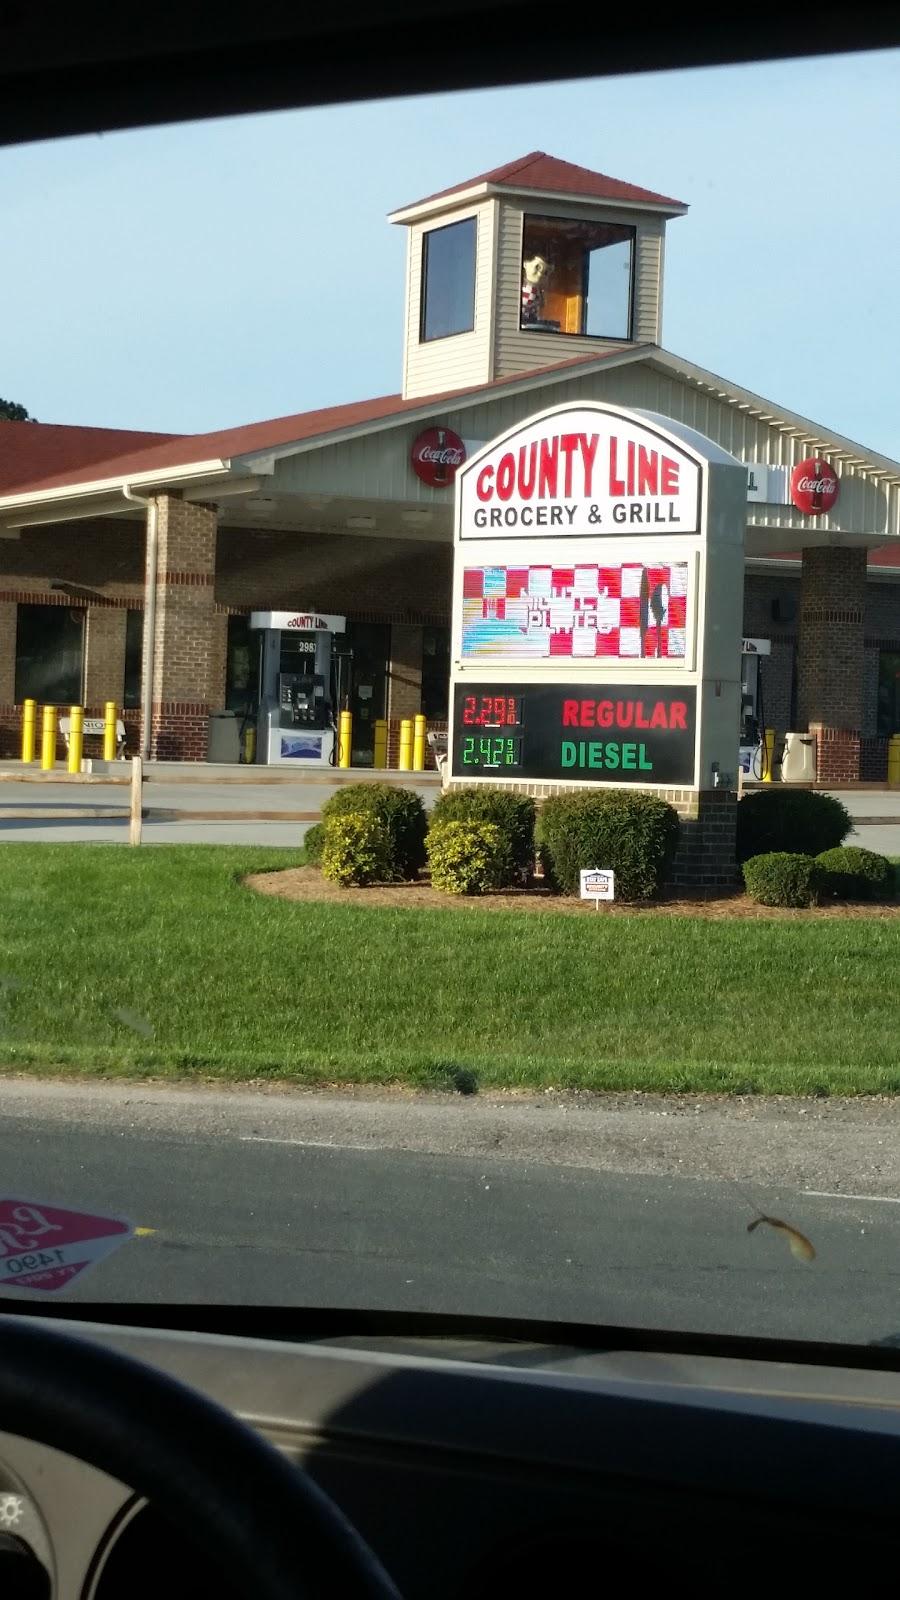 County Line Grocery & Grill - atm  | Photo 7 of 10 | Address: 2981 Pilot-Riley Rd, Zebulon, NC 27597, USA | Phone: (919) 269-0024